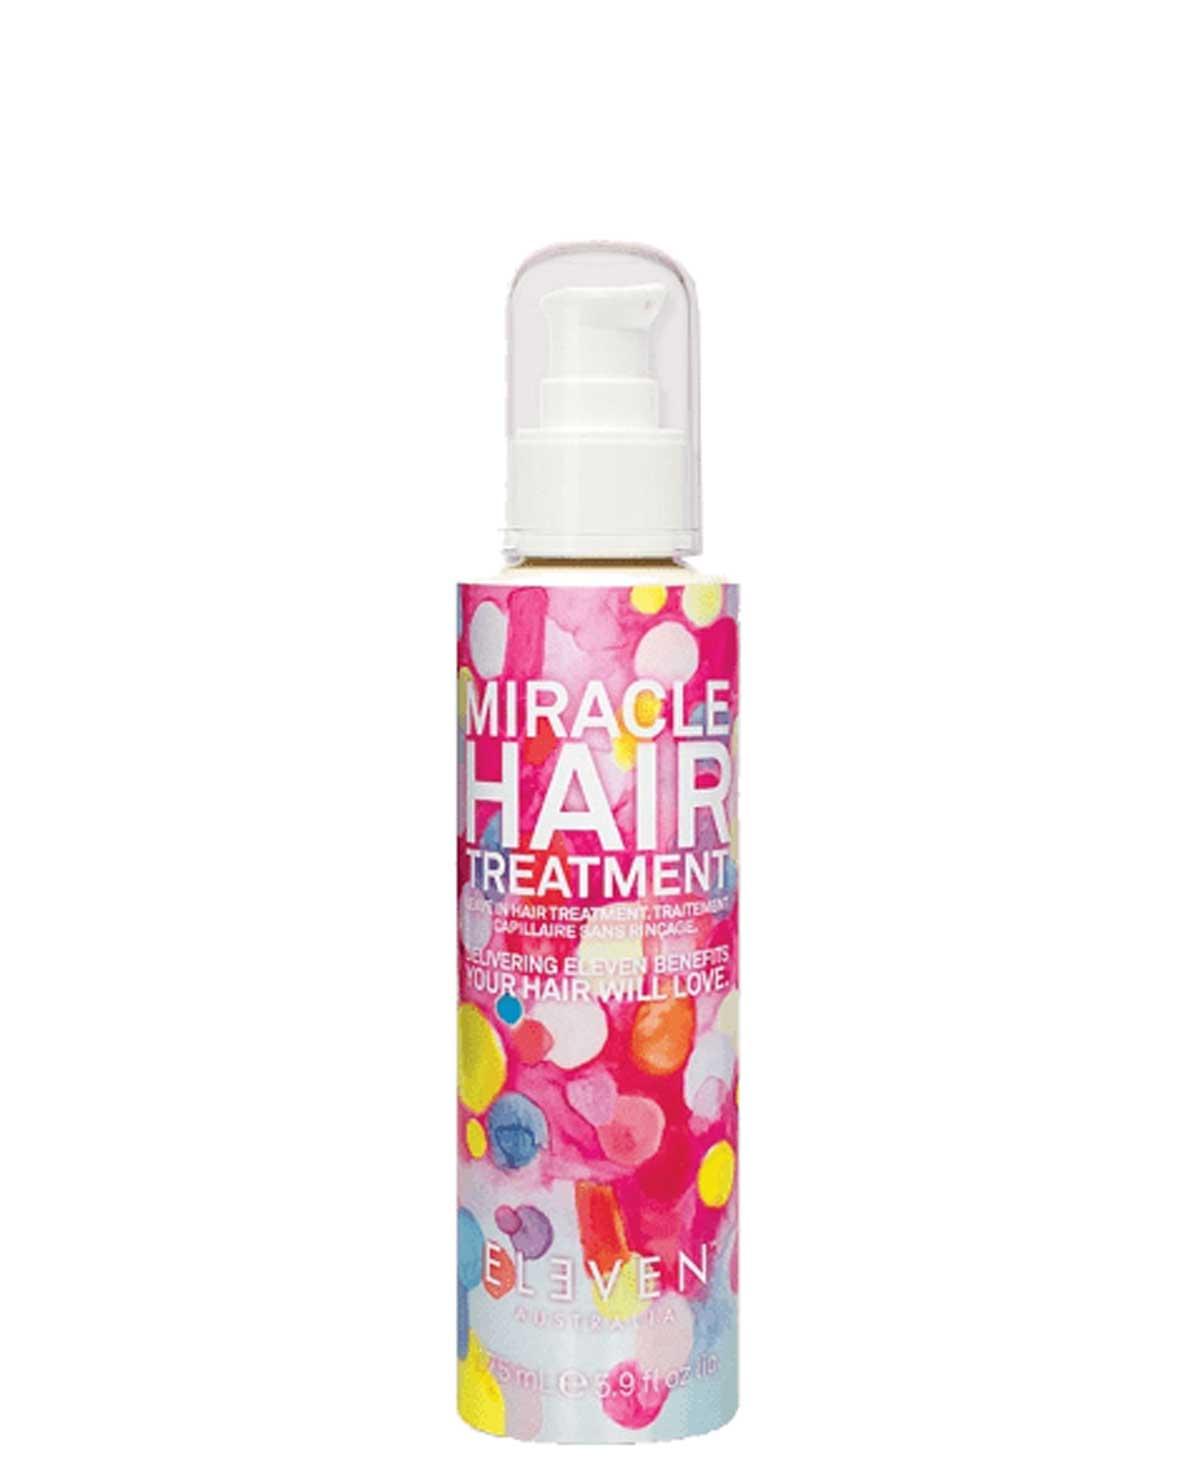 Ltd. Ed. Miracle Treatment 175ml - A